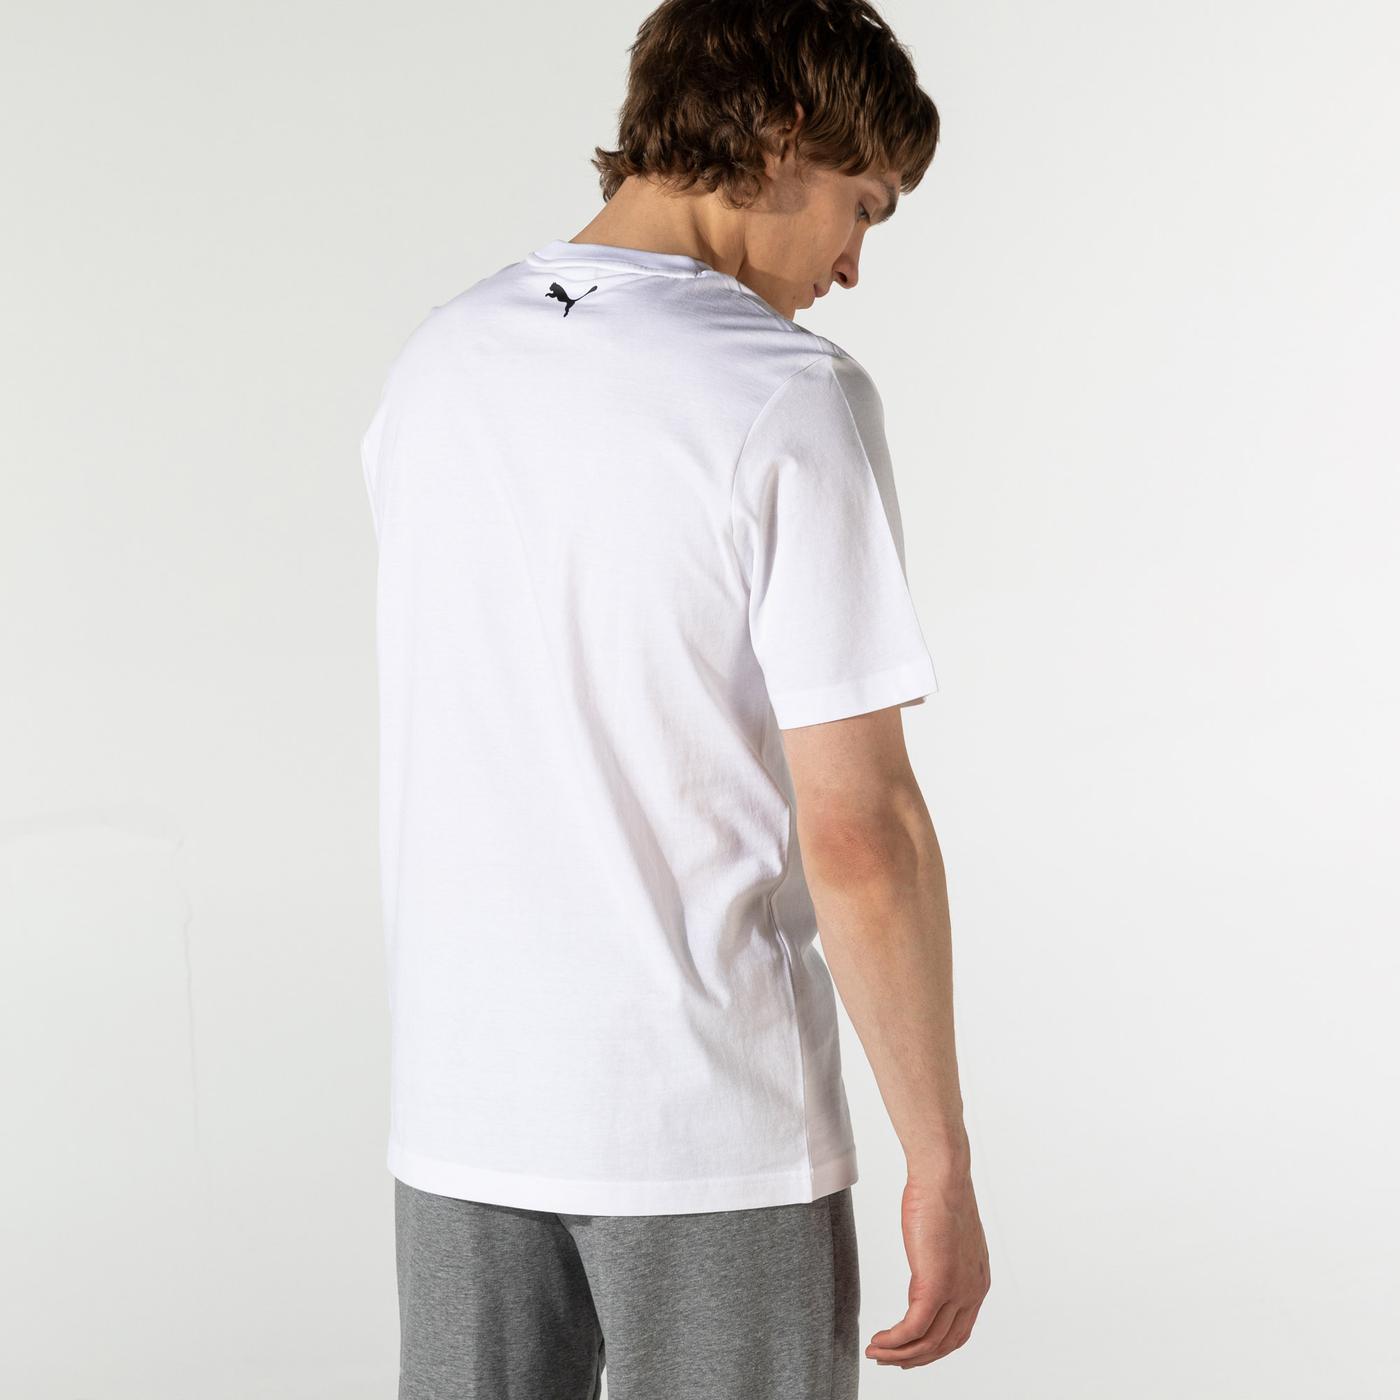 Puma Decor8 Graphic Unisex Beyaz T-Shirt